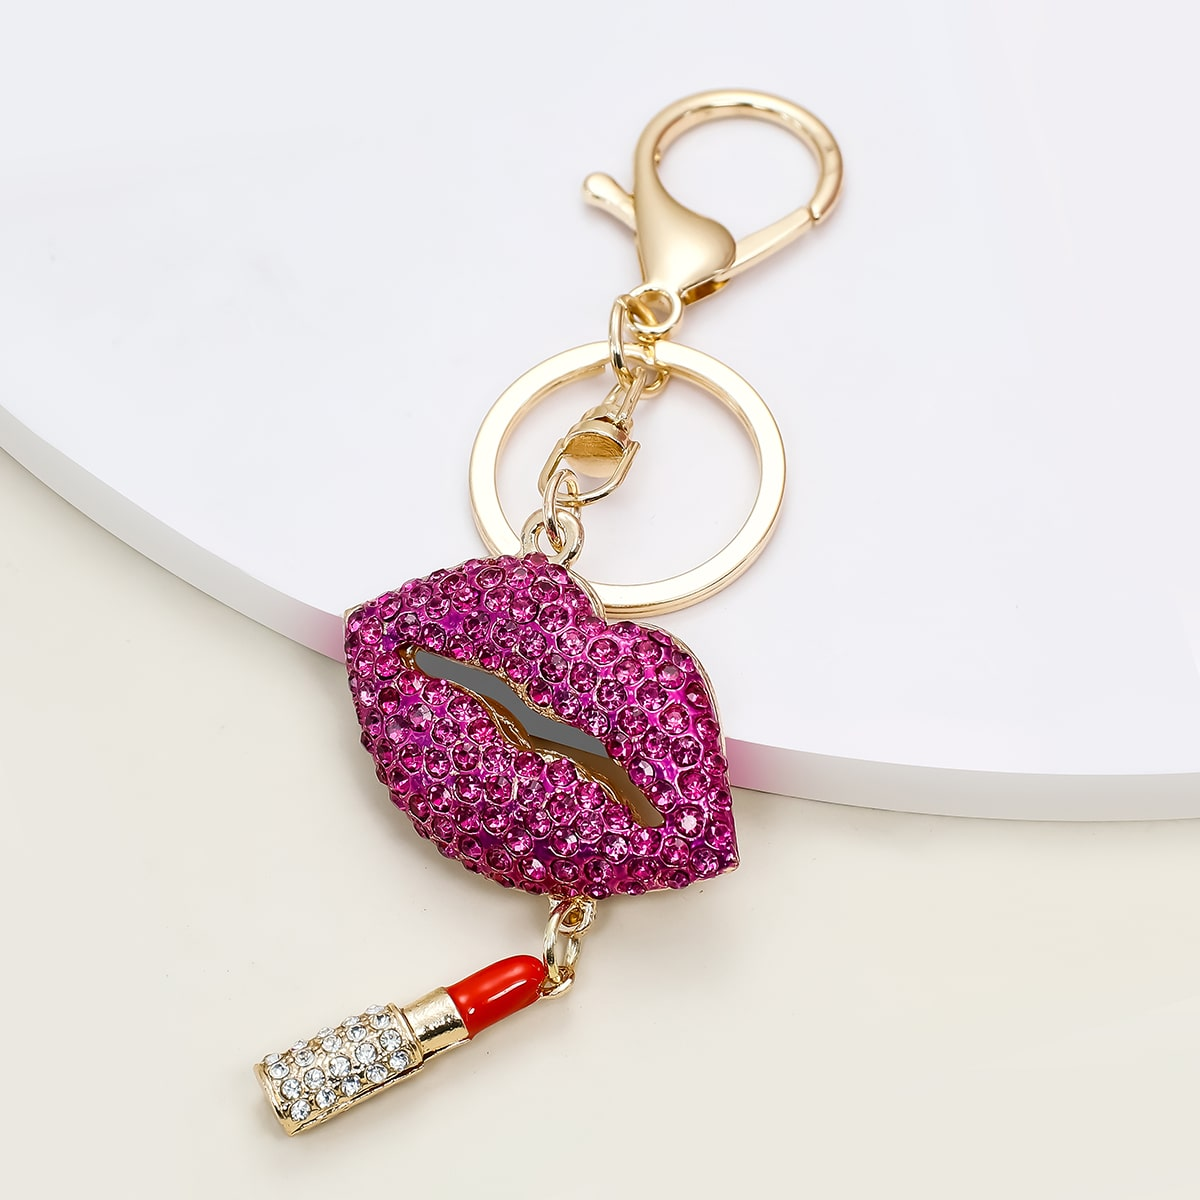 Lip & Lipstick Pendant Keychain